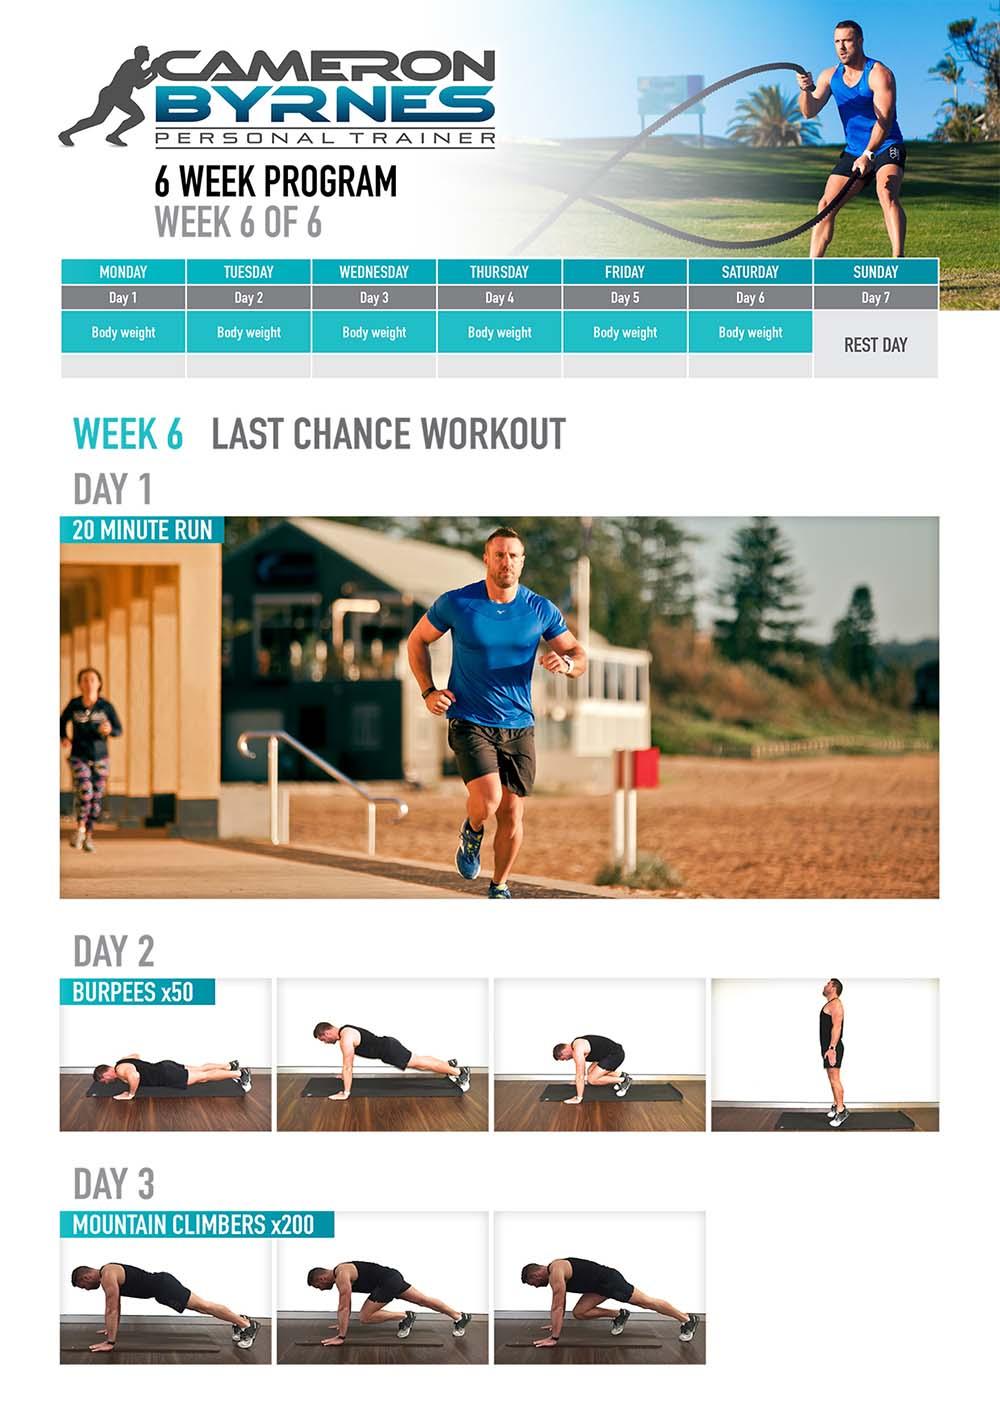 Cameron Byrnes workout program